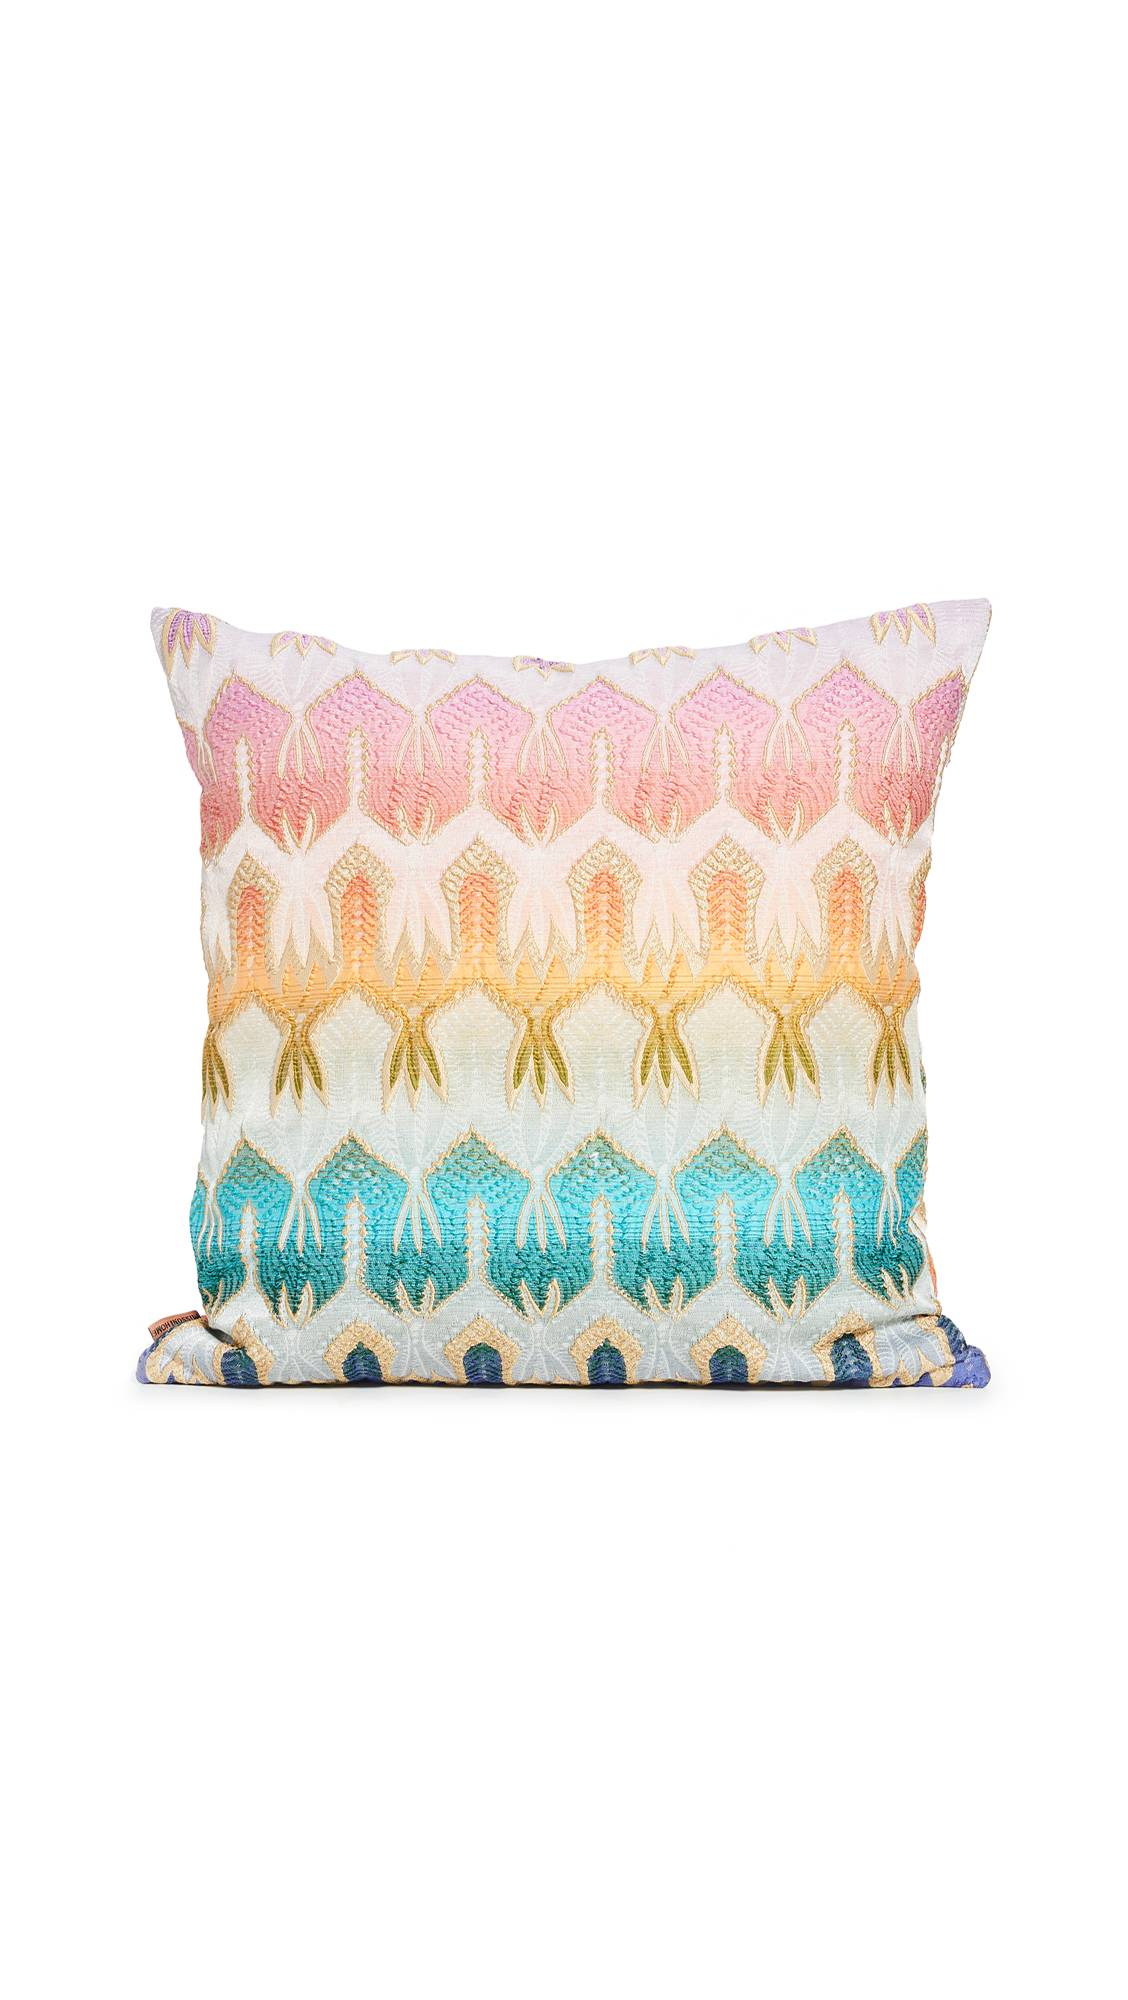 Missoni Home Pasadena Cushion  - Multicolor - Size: One Size